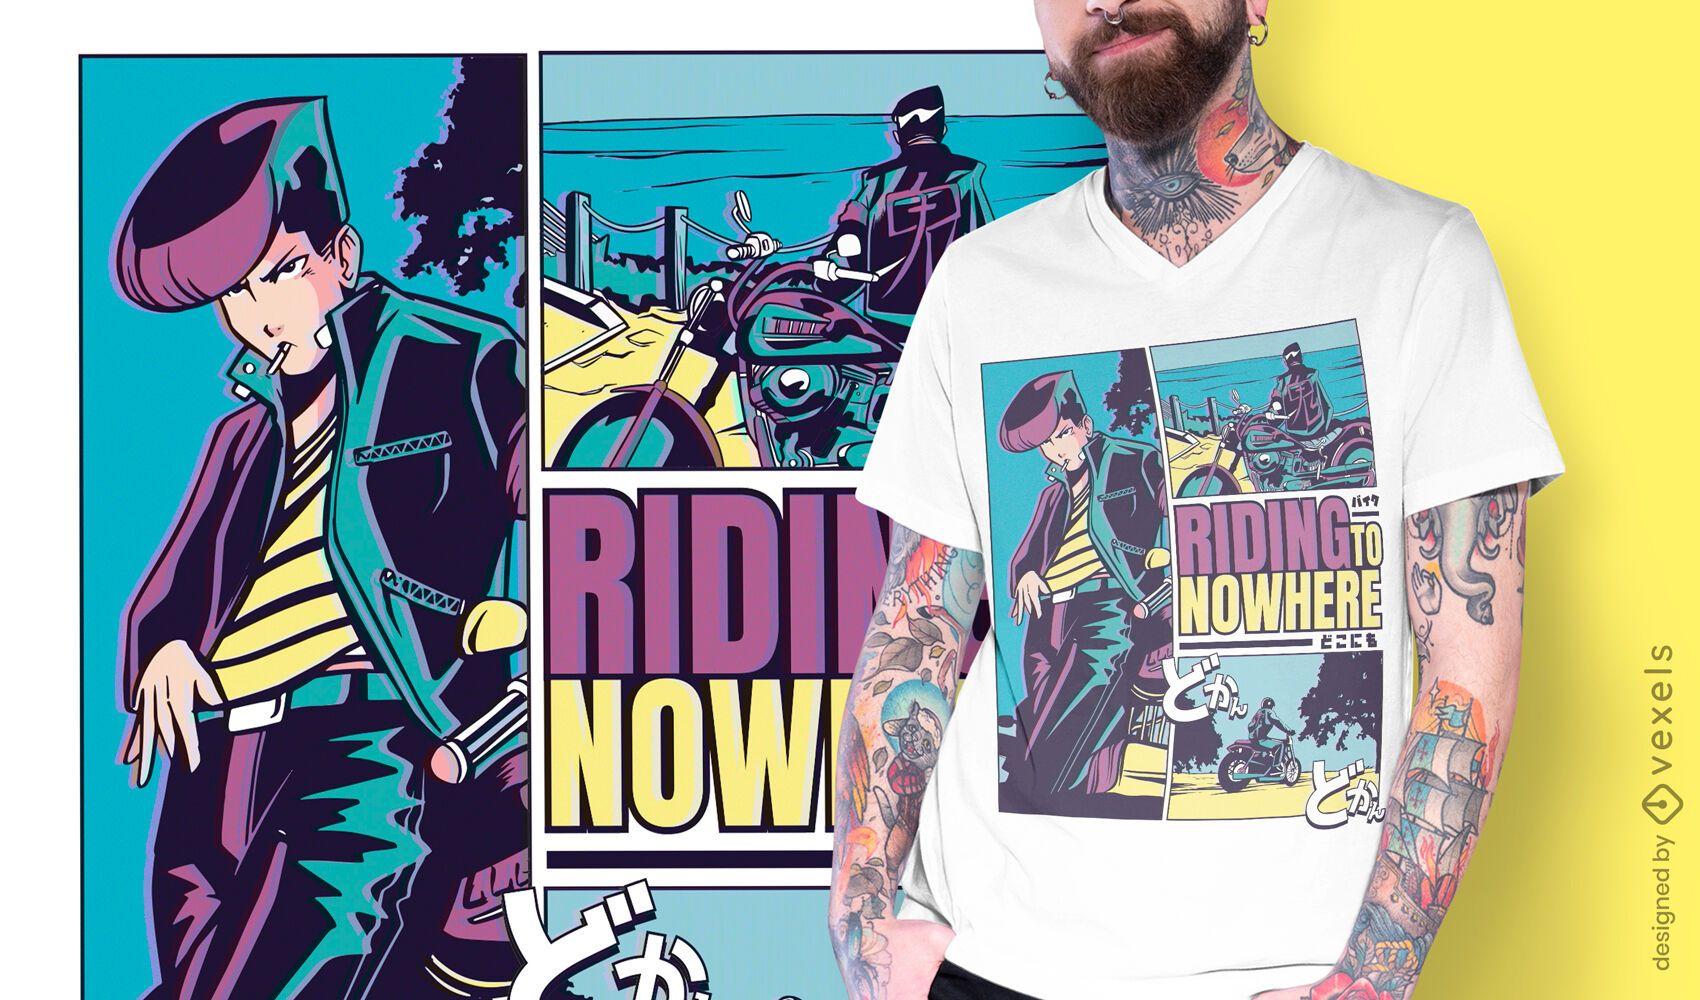 Riding nowhere anime t-shirt design